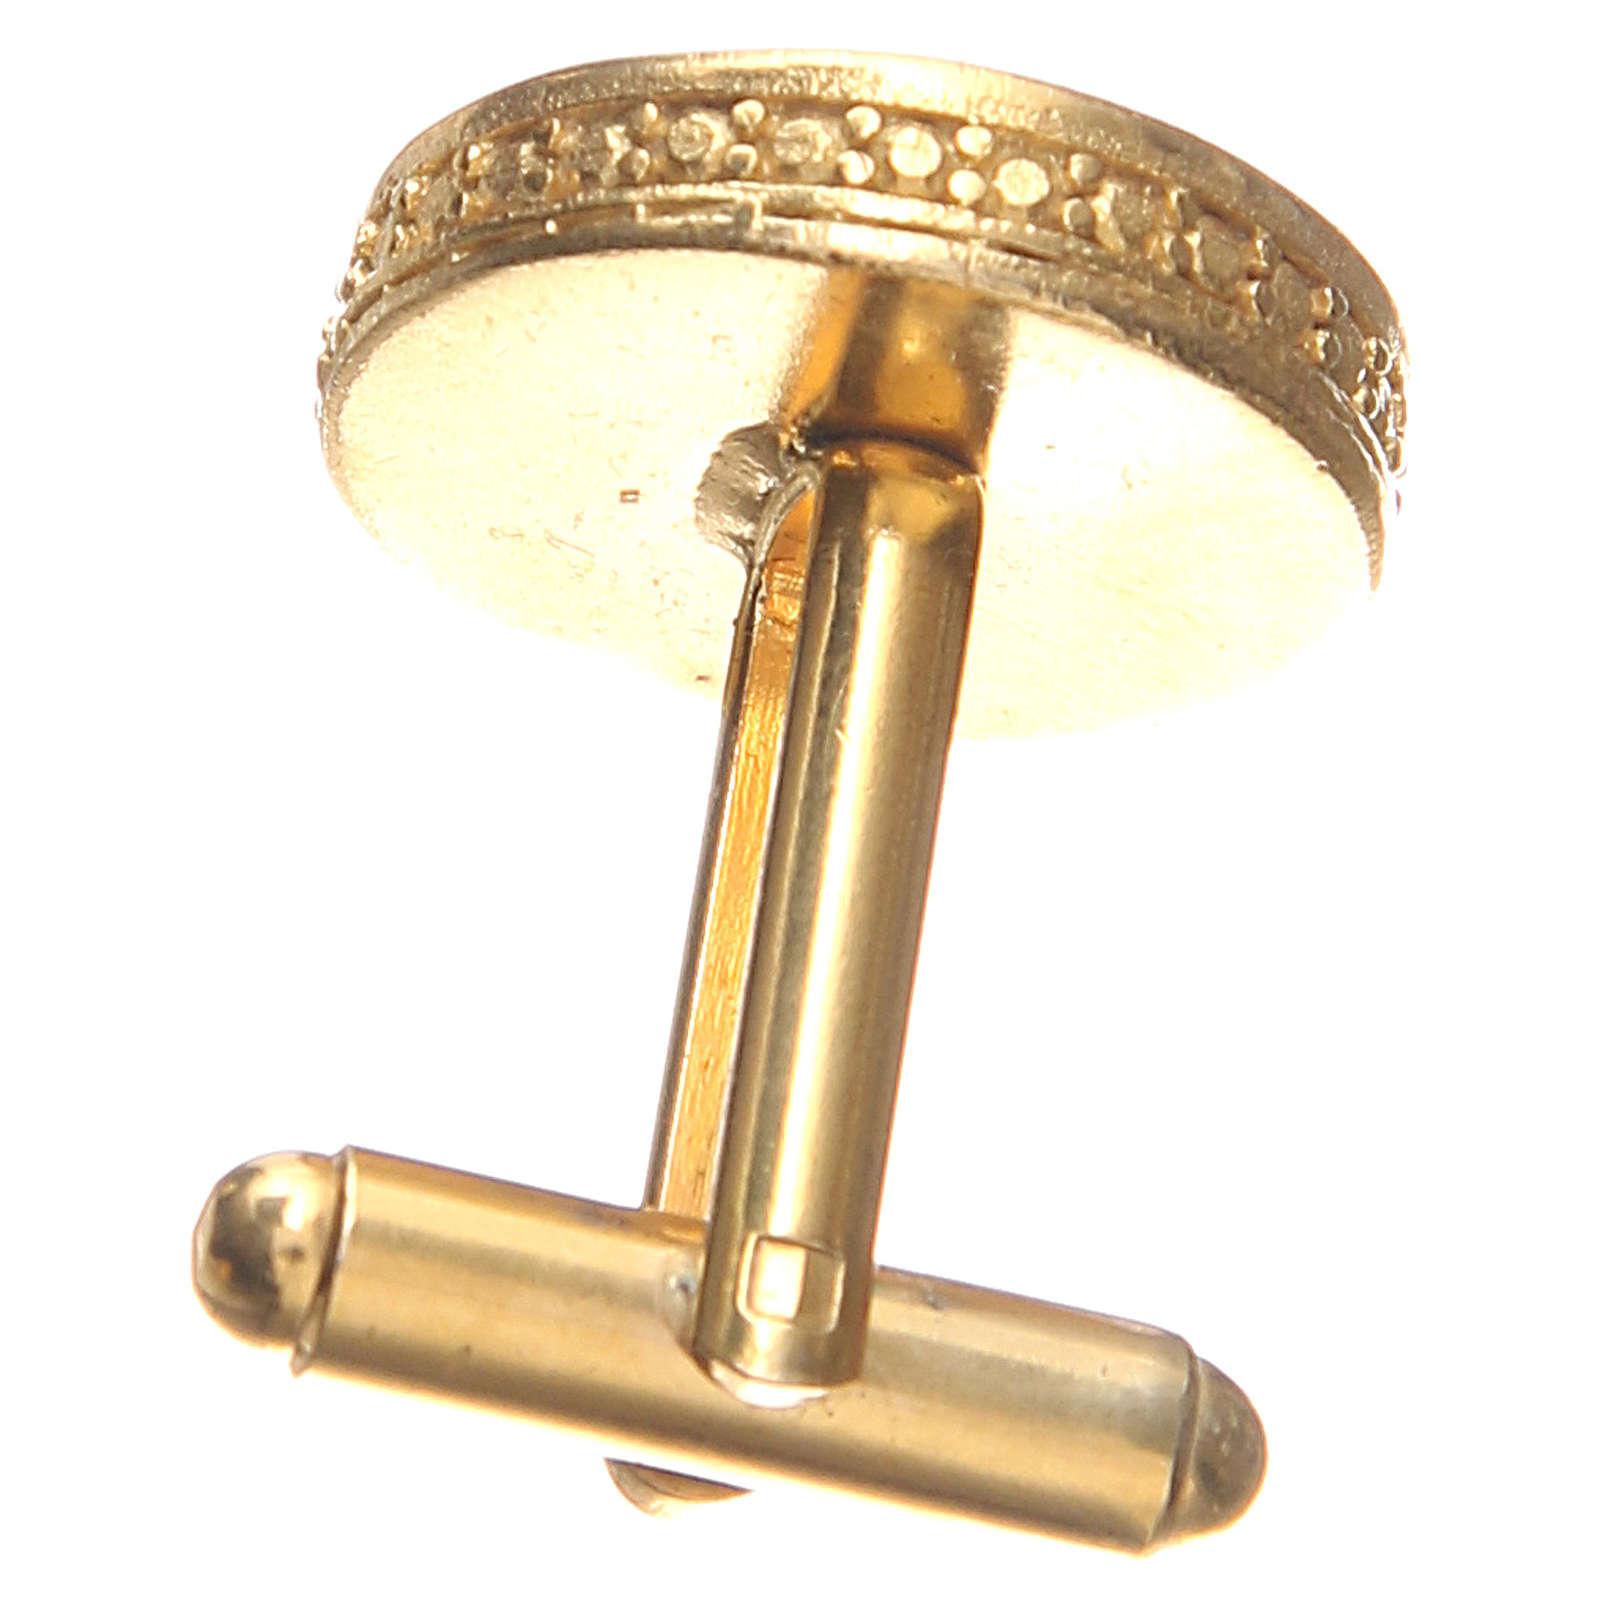 Spinki do koszuli srebro 800 symbol PAX 1.7 cm 4